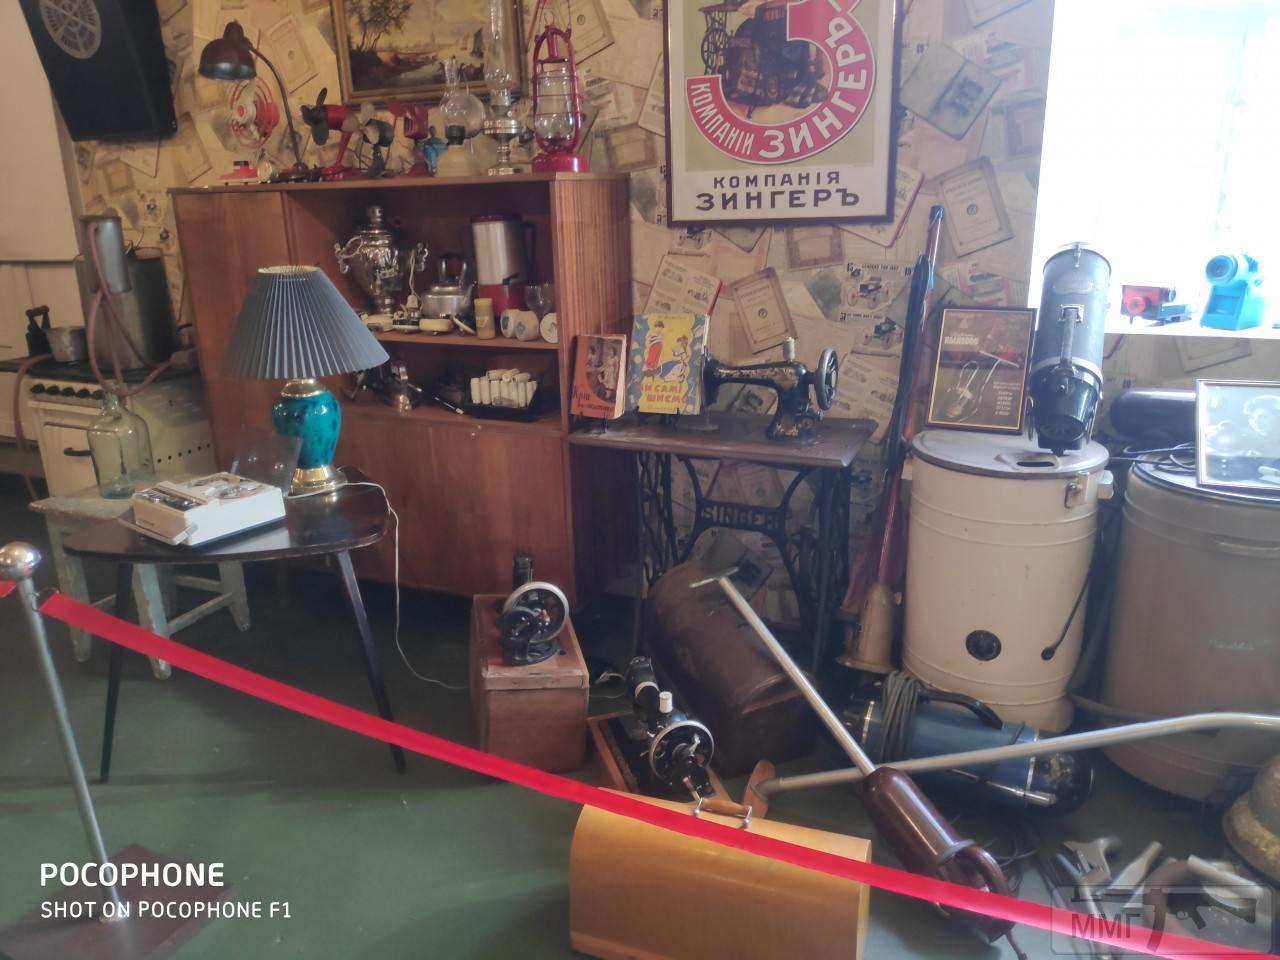 71118 - Музей техники Фаэтон в г. Запорожье